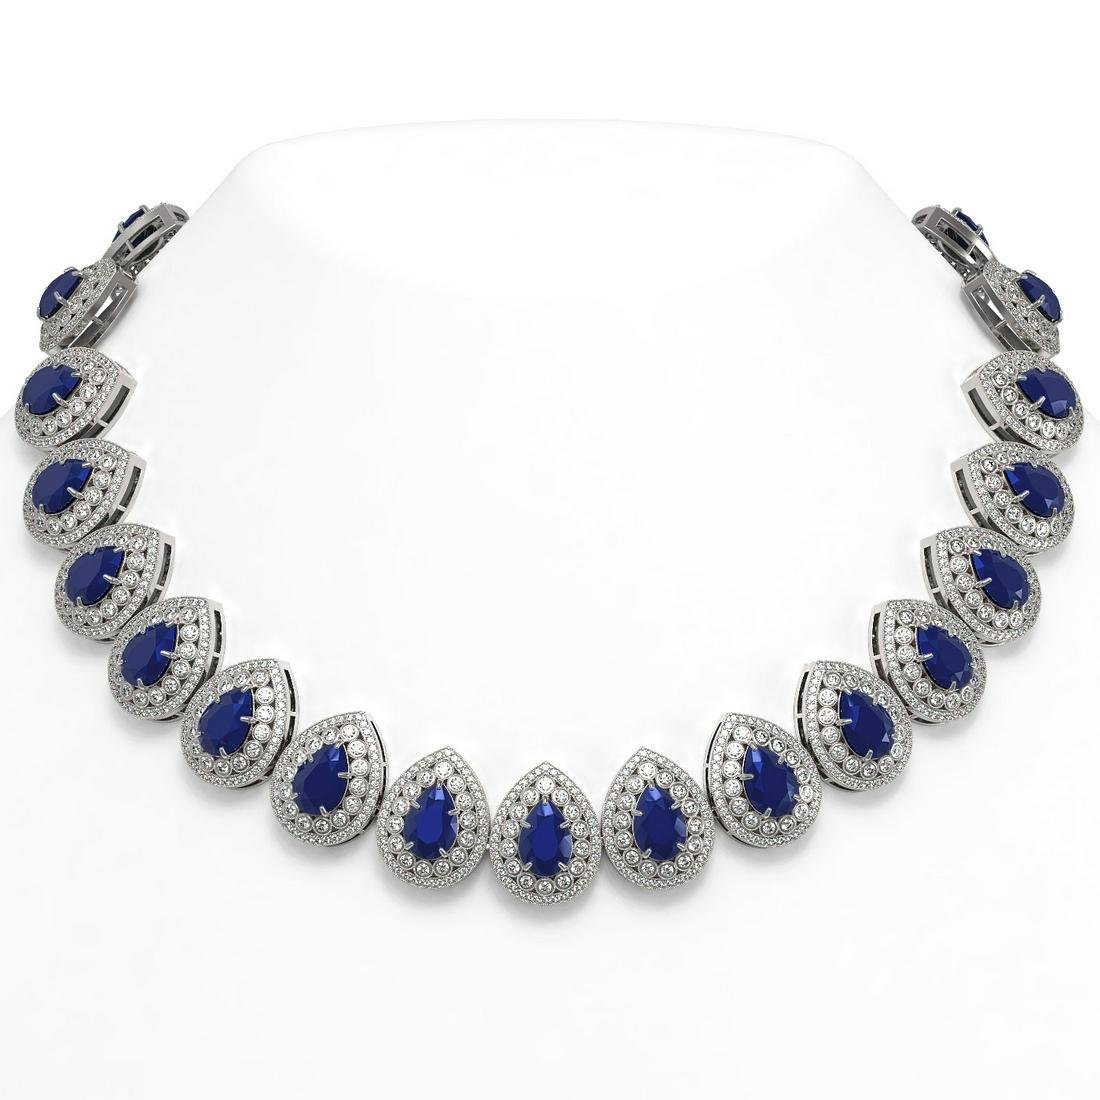 121.42 ctw Sapphire & Diamond Necklace 14K White Gold -